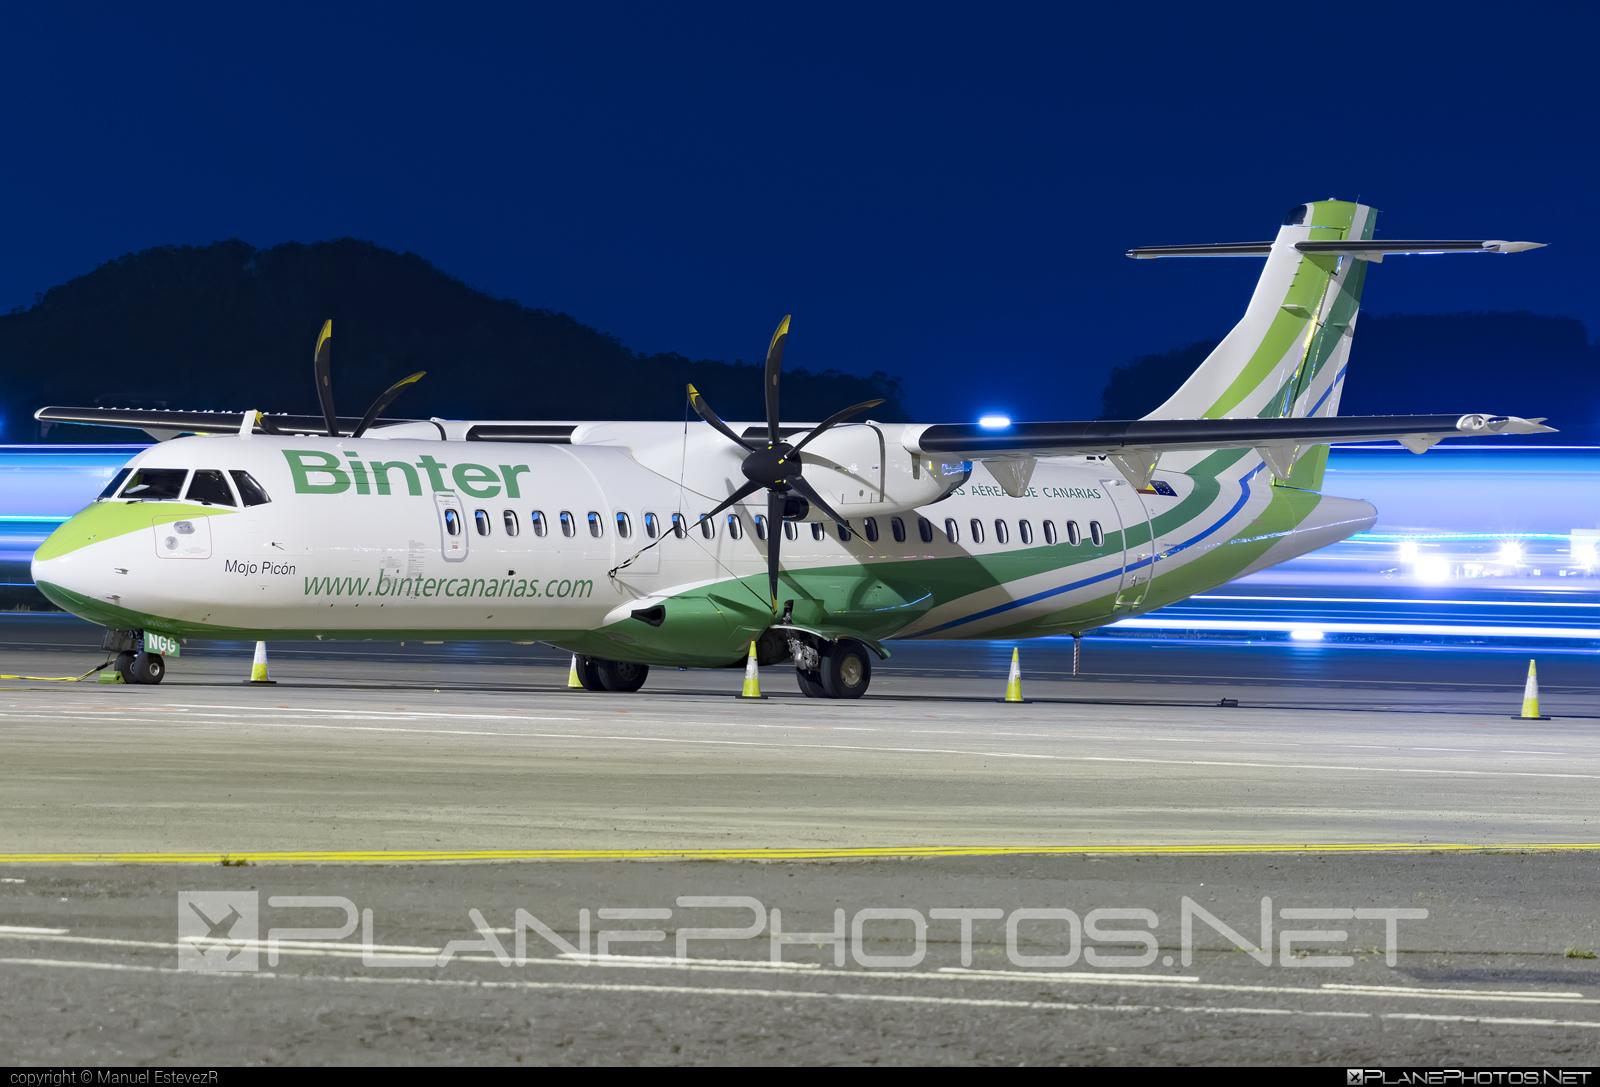 ATR 72-600 - EC-NGG operated by Binter Canarias #atr